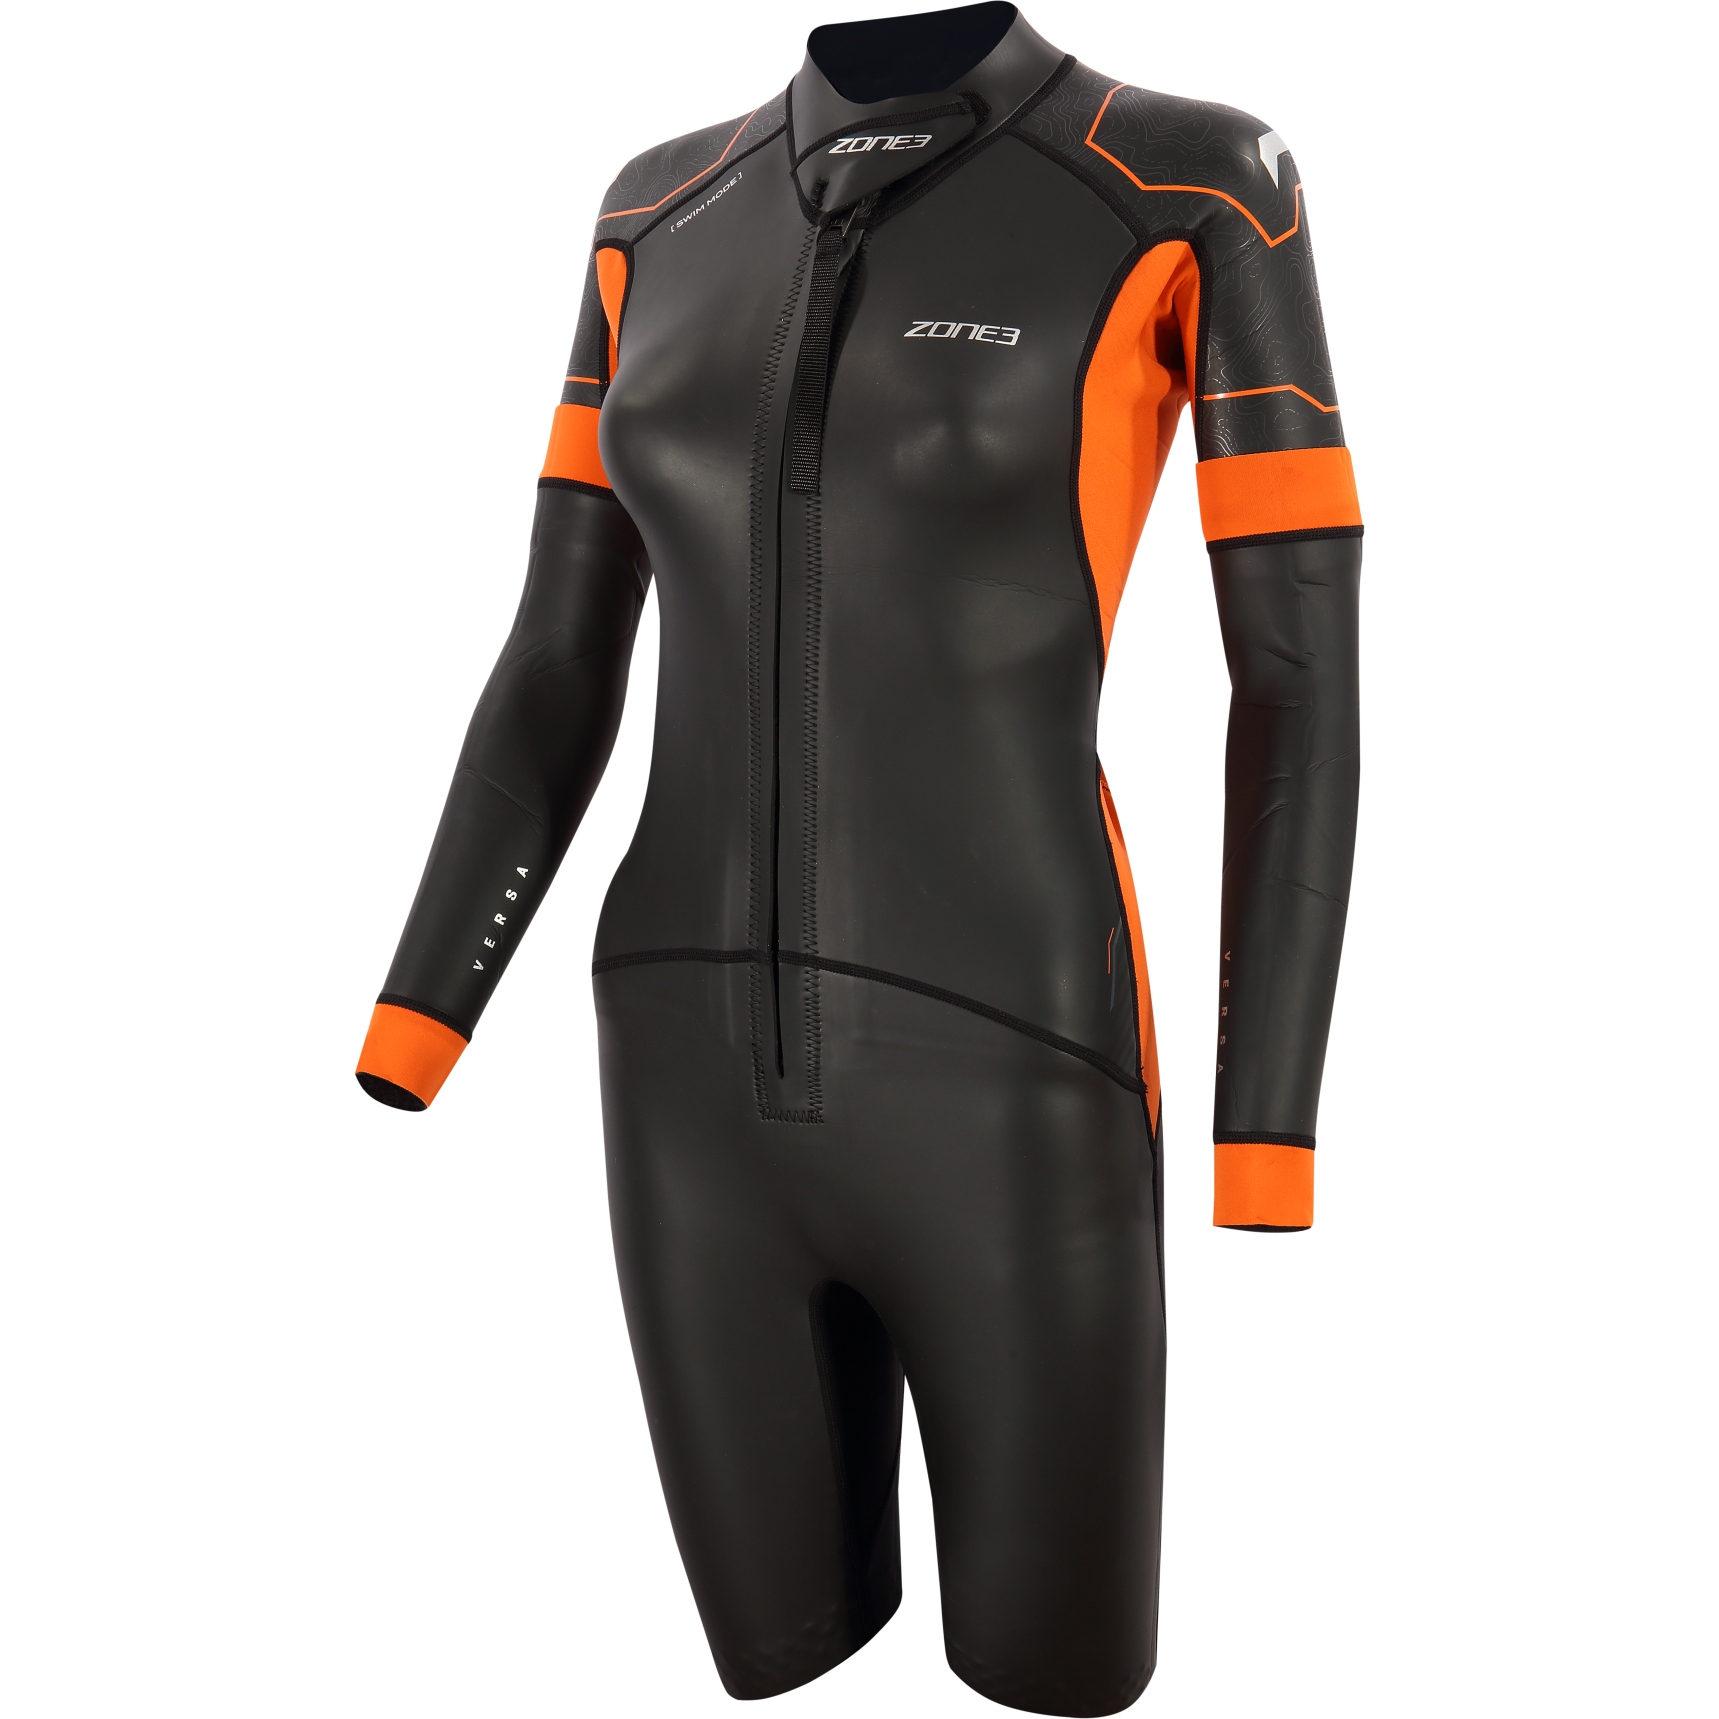 Zone3 Versa Damen Neoprenanzug - black/orange/gunmetal